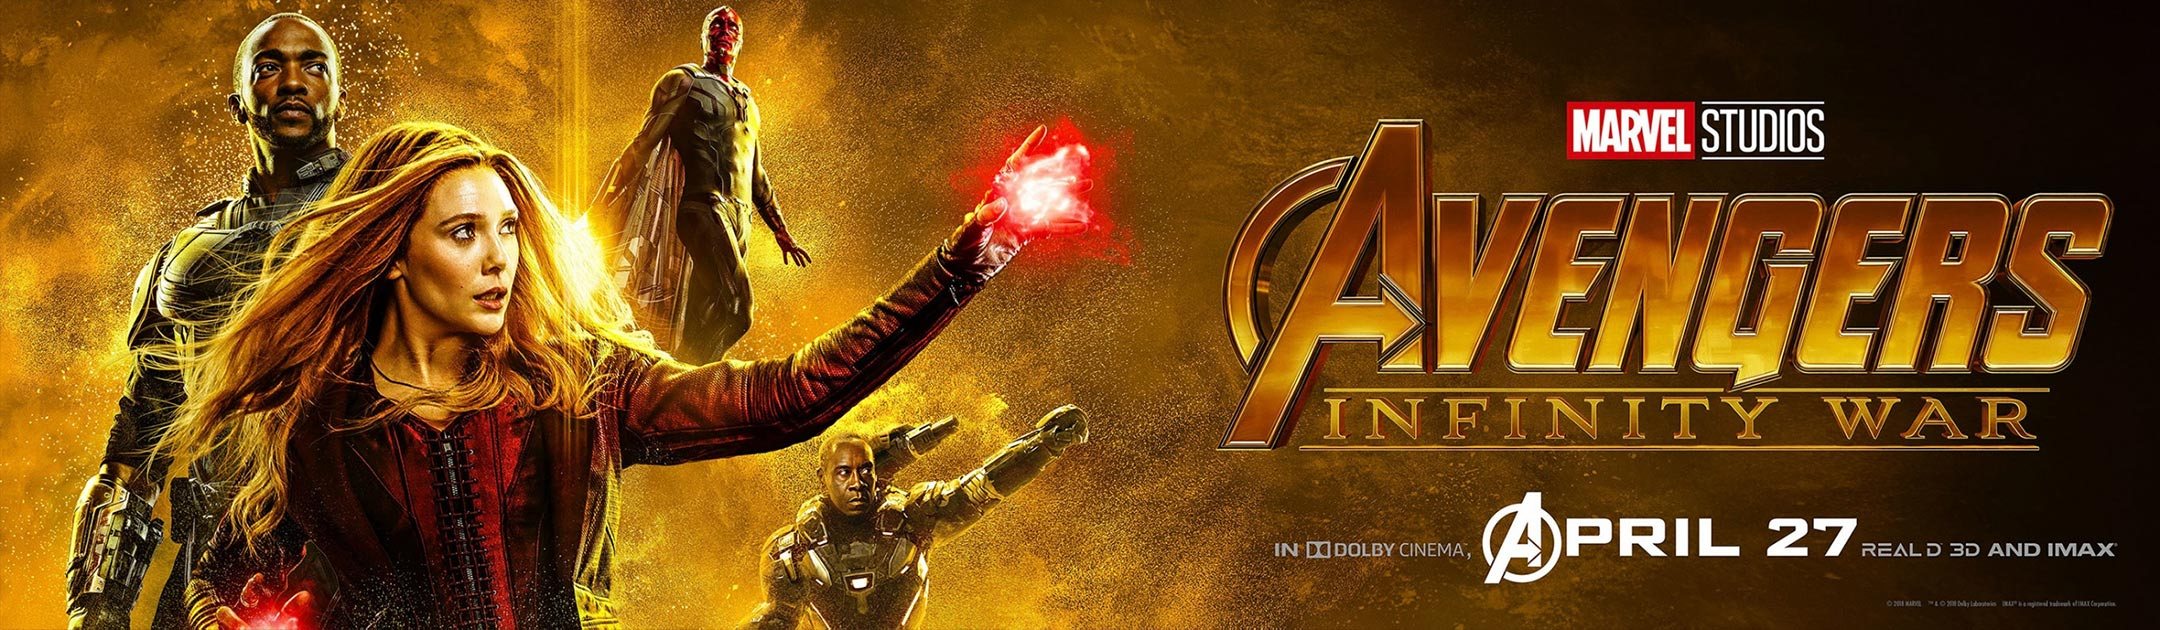 Avengers Infinity War 2018 Poster 37 Trailer Addict